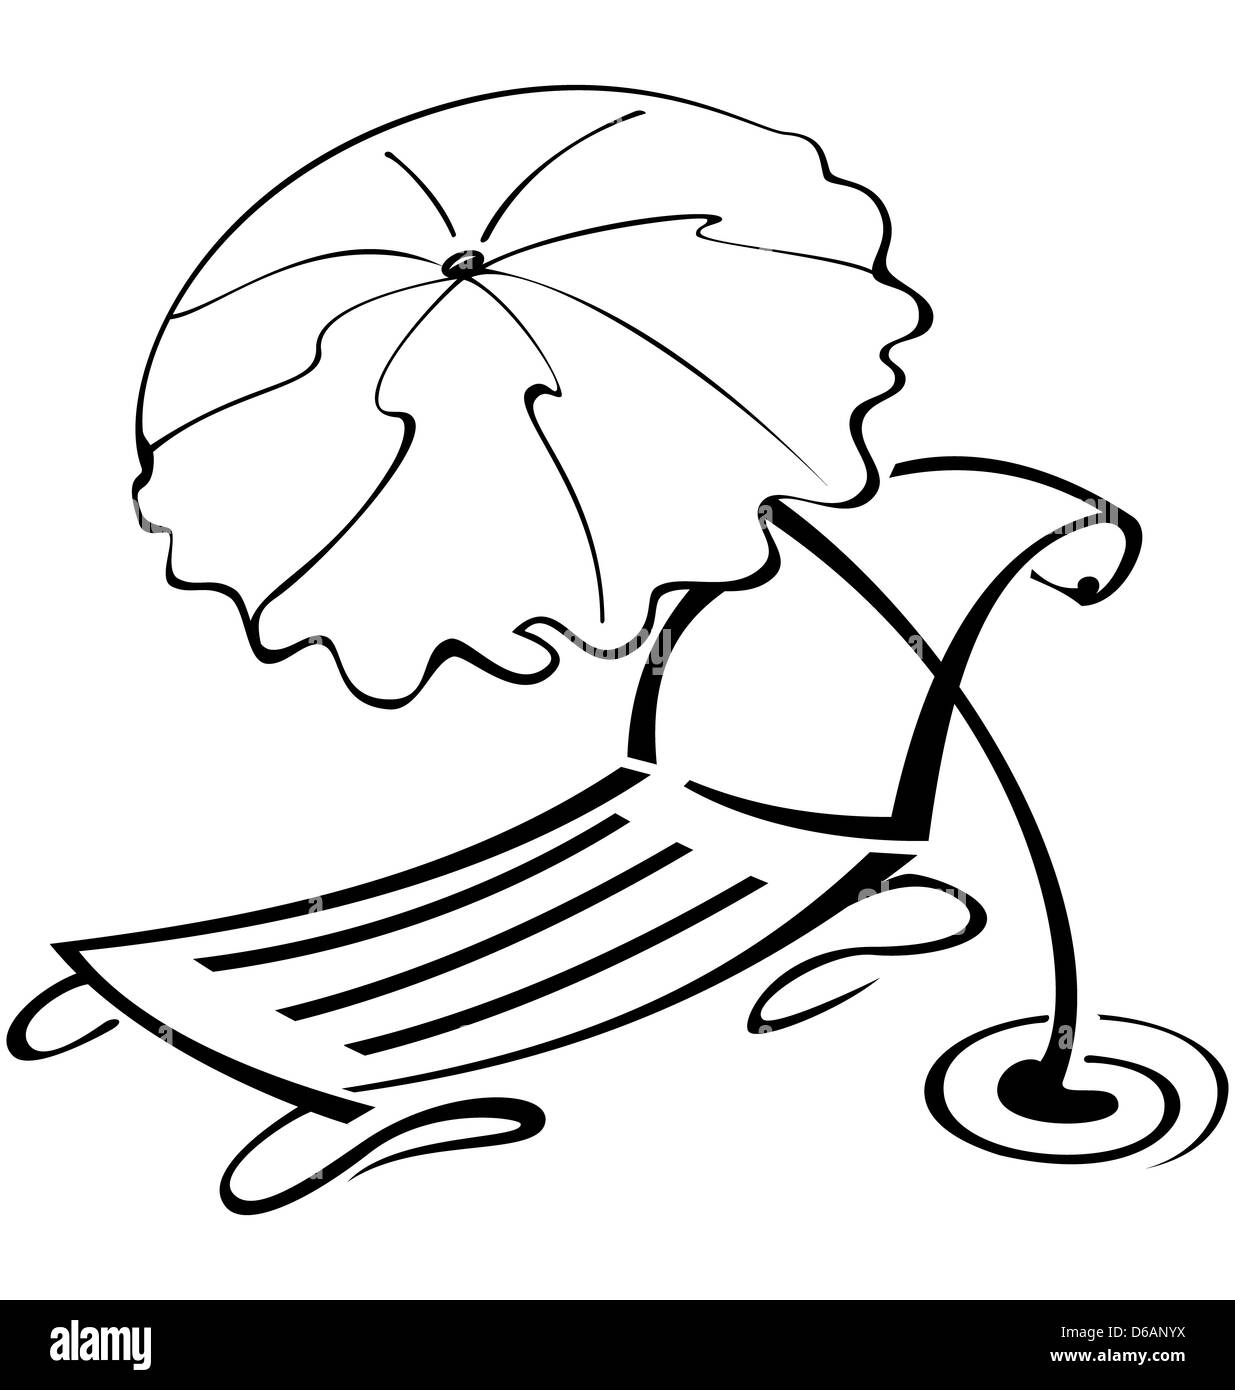 Beach chair and umbrella black and white - Black And White Contour Umbrella And Beach Chair